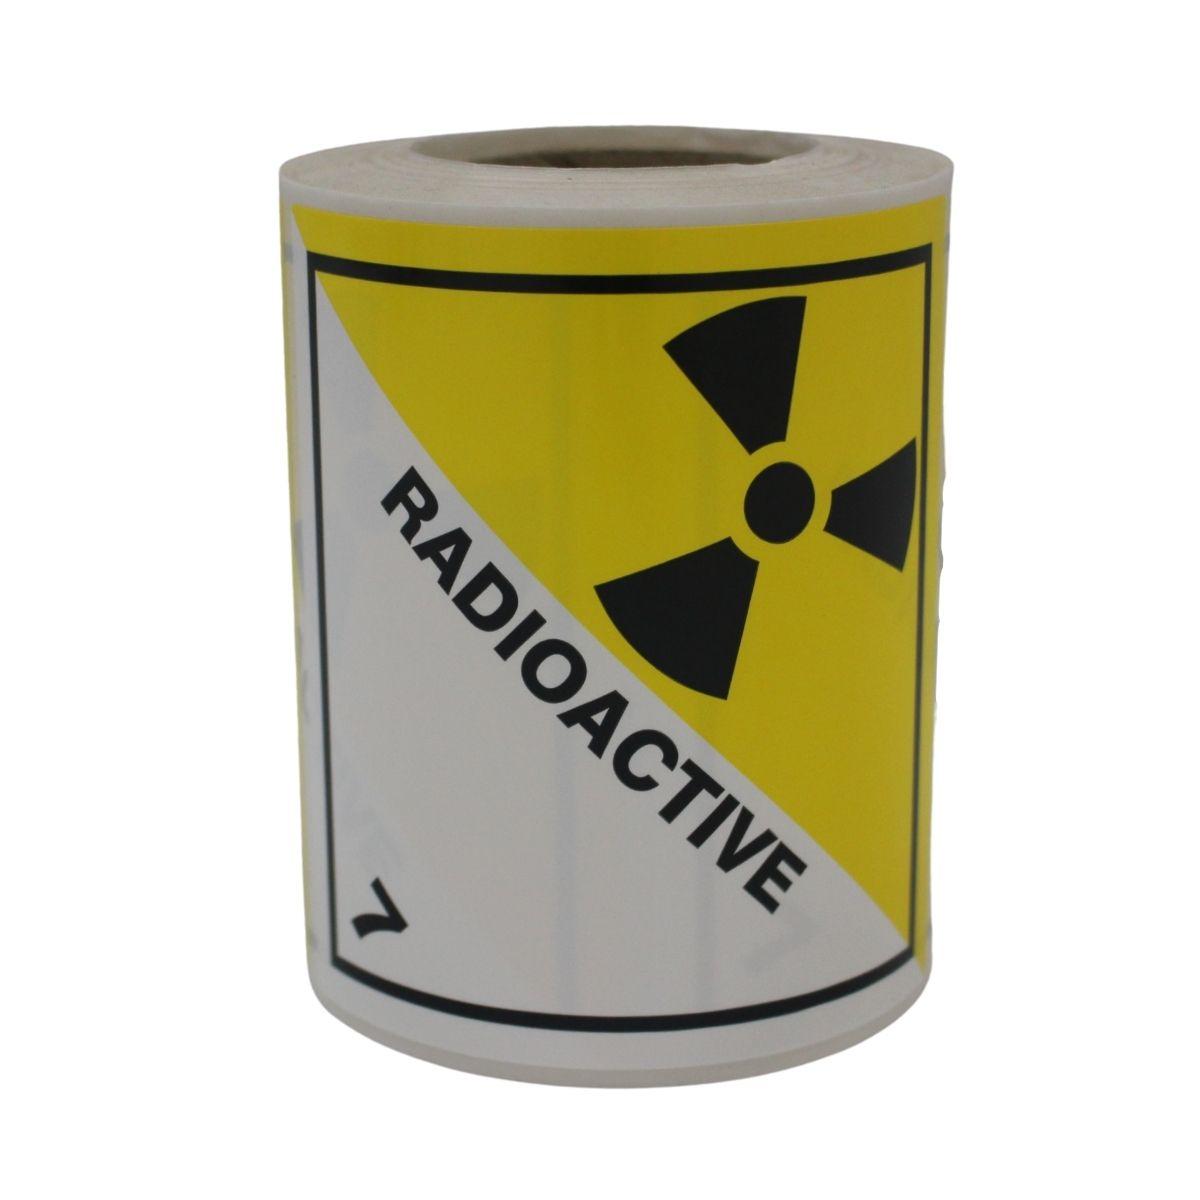 HD8710 UN Diamonds S_A on Roll 100 x 100mm 250 Labels Class 7 Radioactive